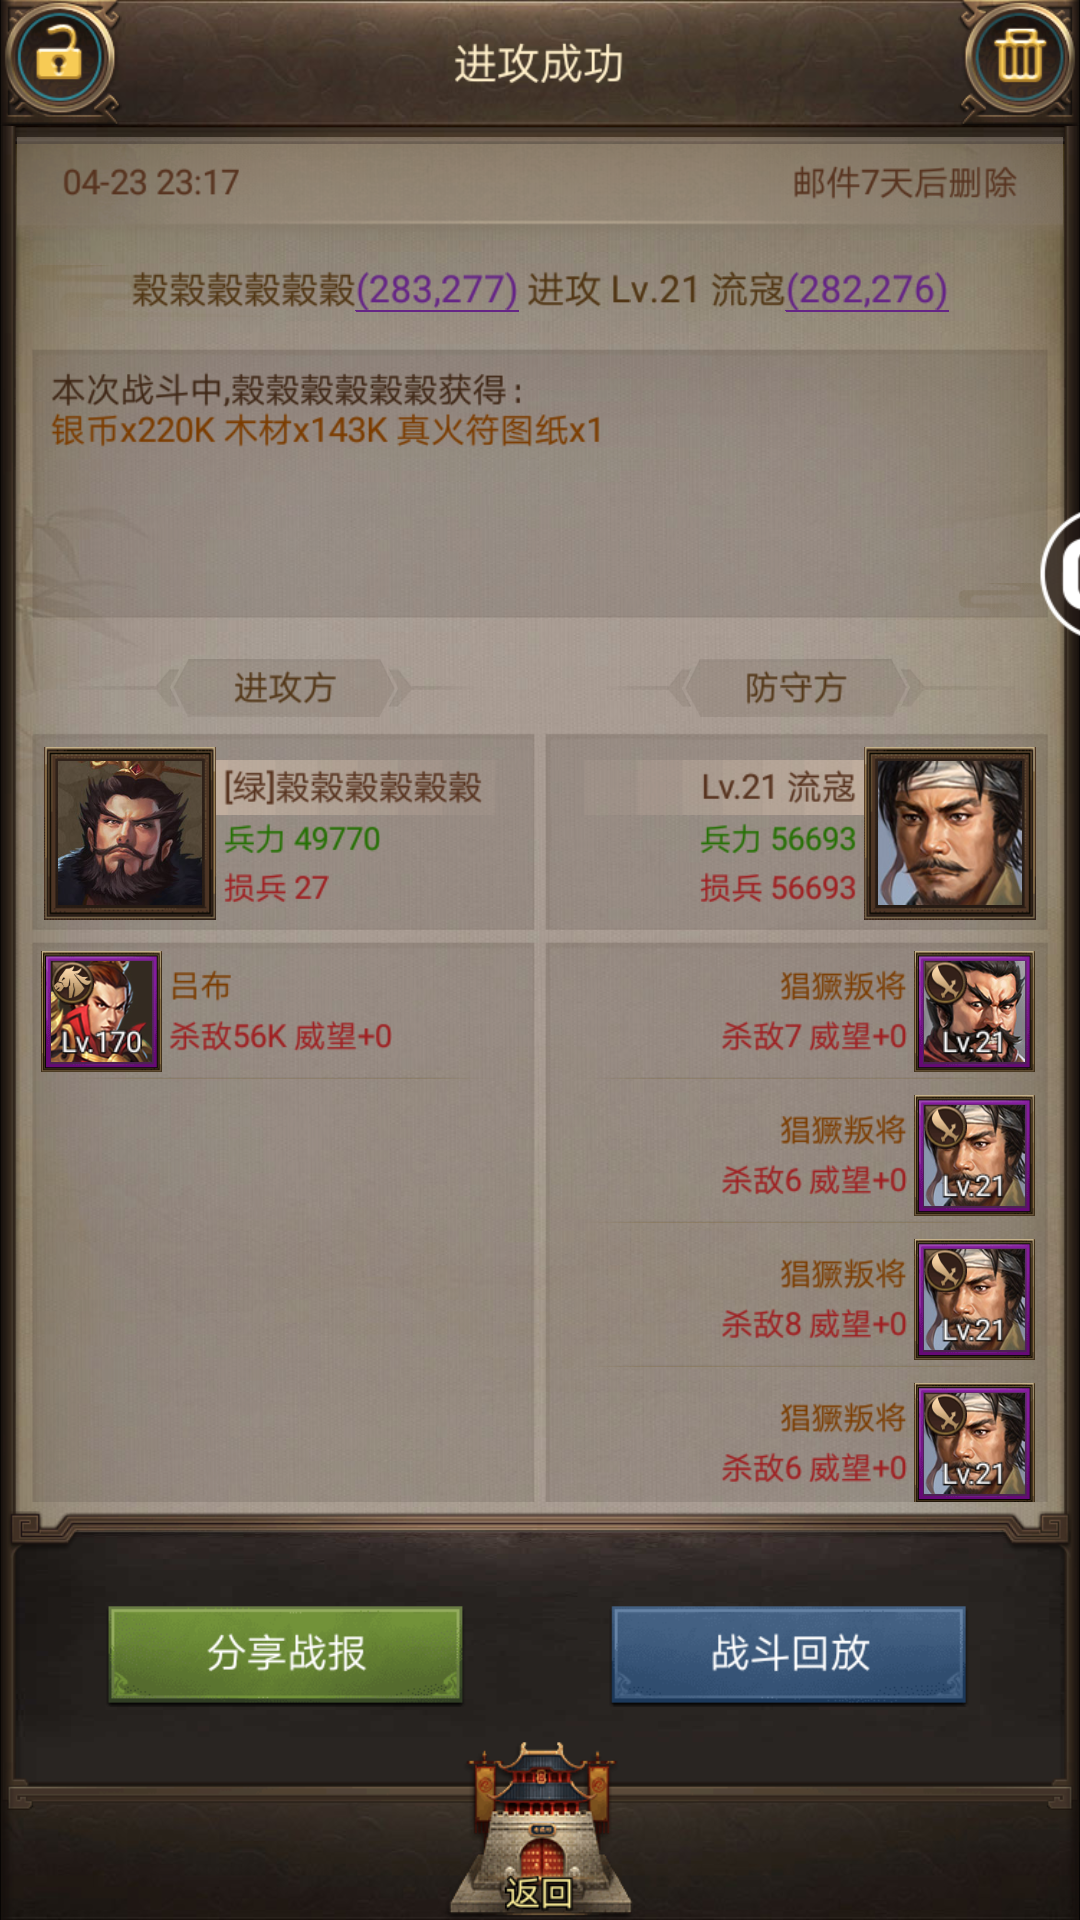 Screenshot_20190423-231733.png